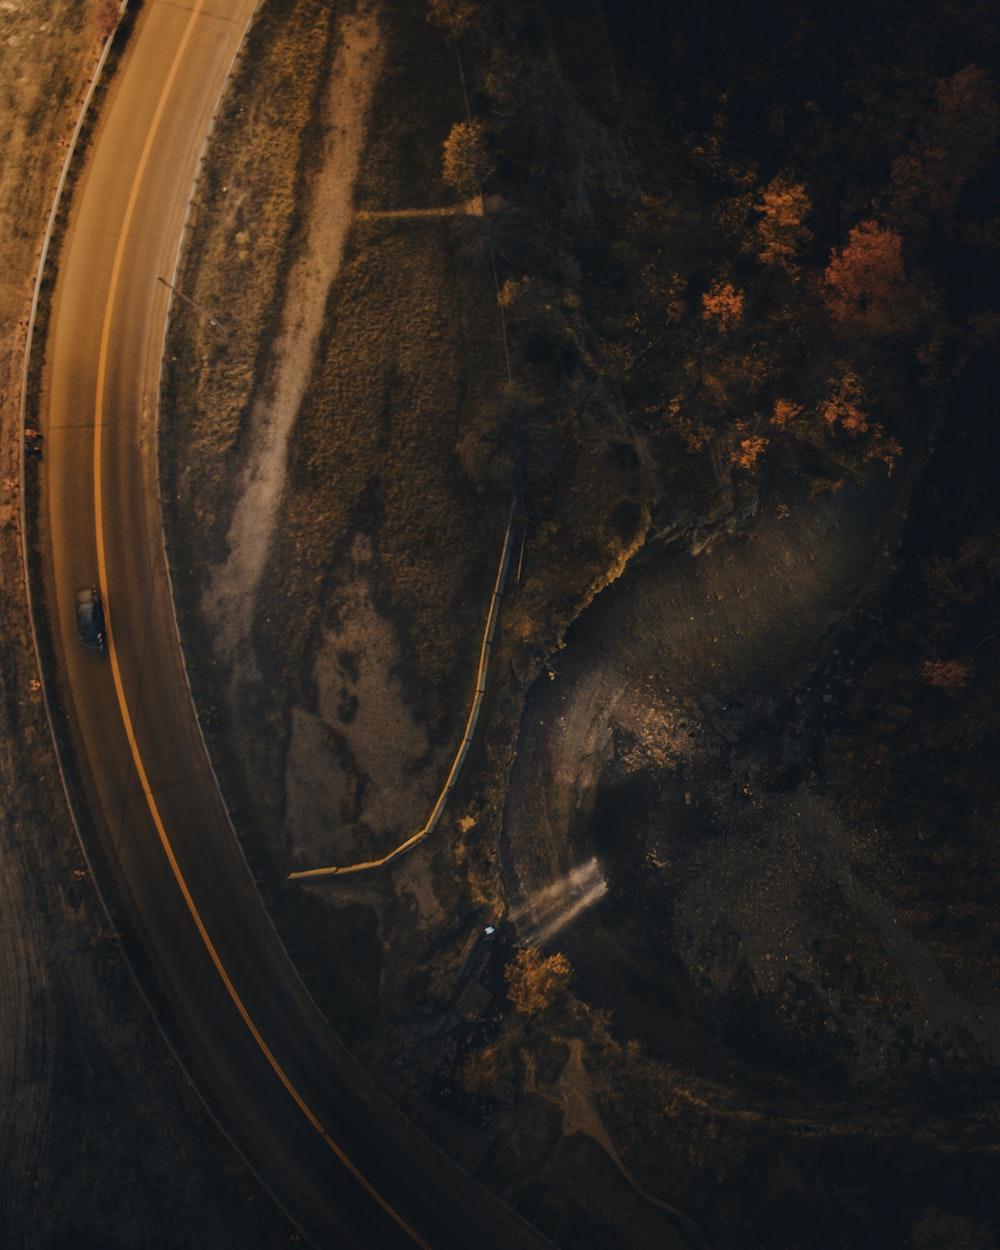 birds eye view of road